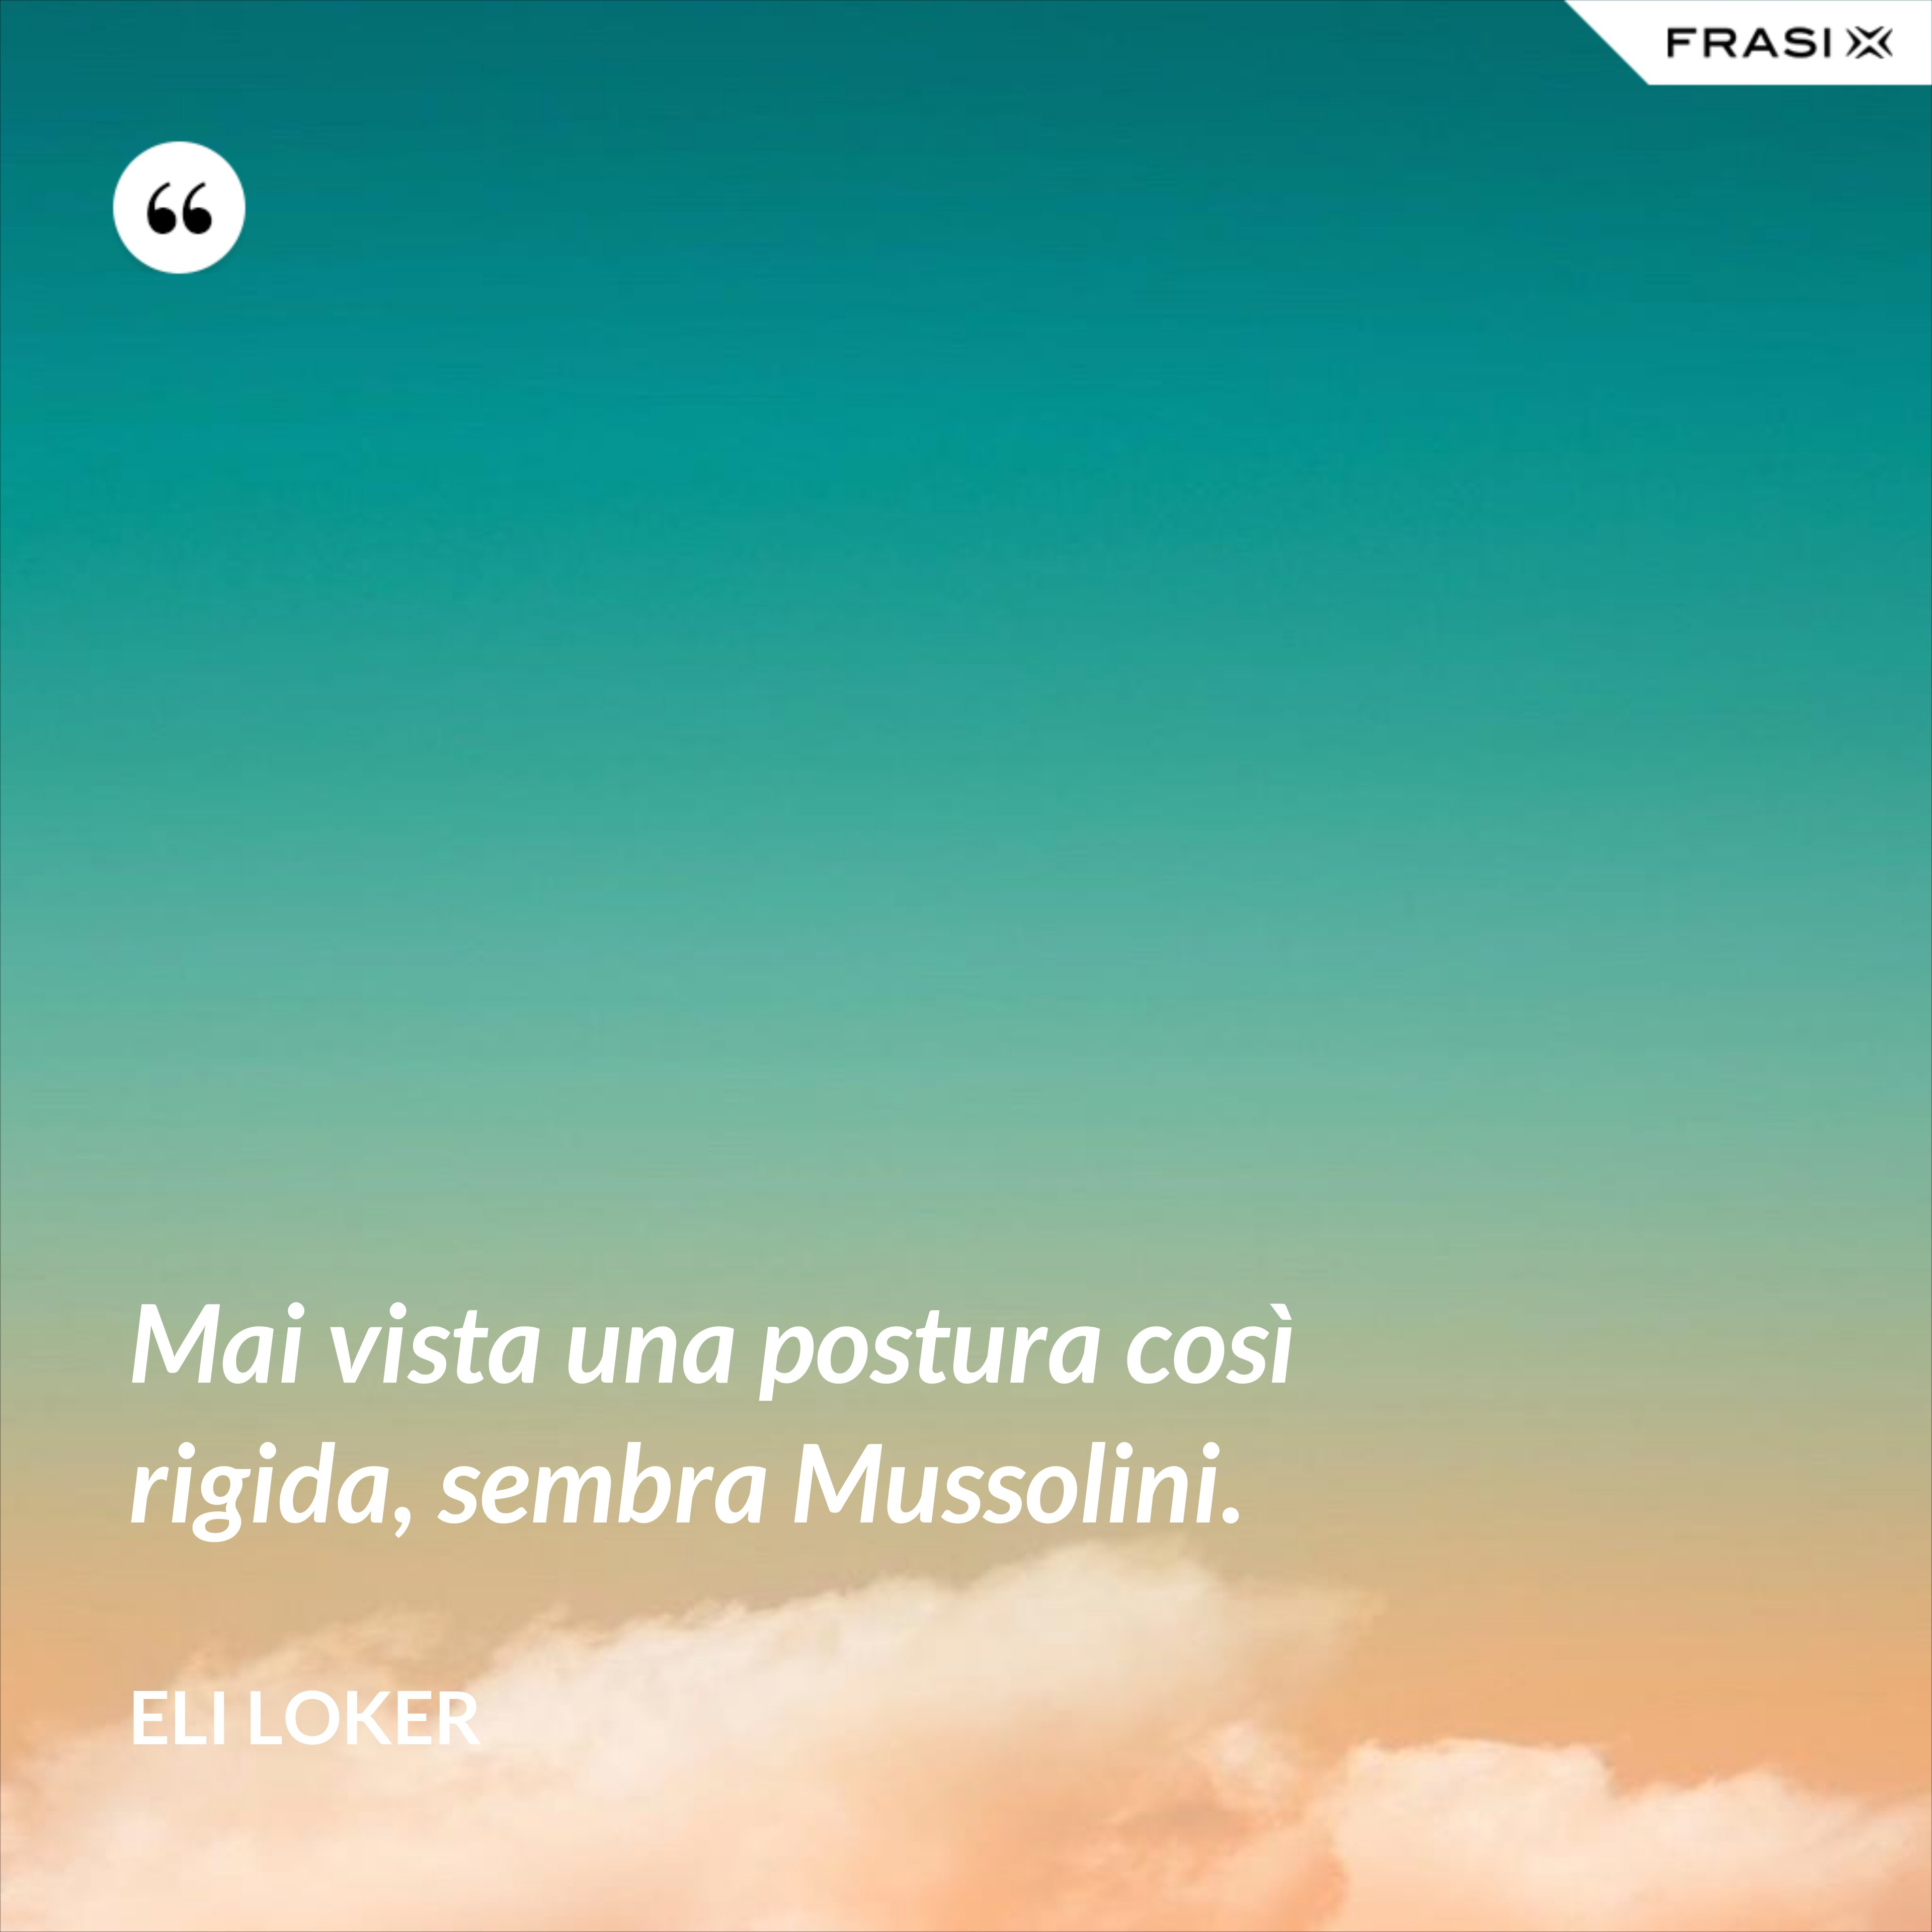 Mai vista una postura così rigida, sembra Mussolini. - Eli Loker